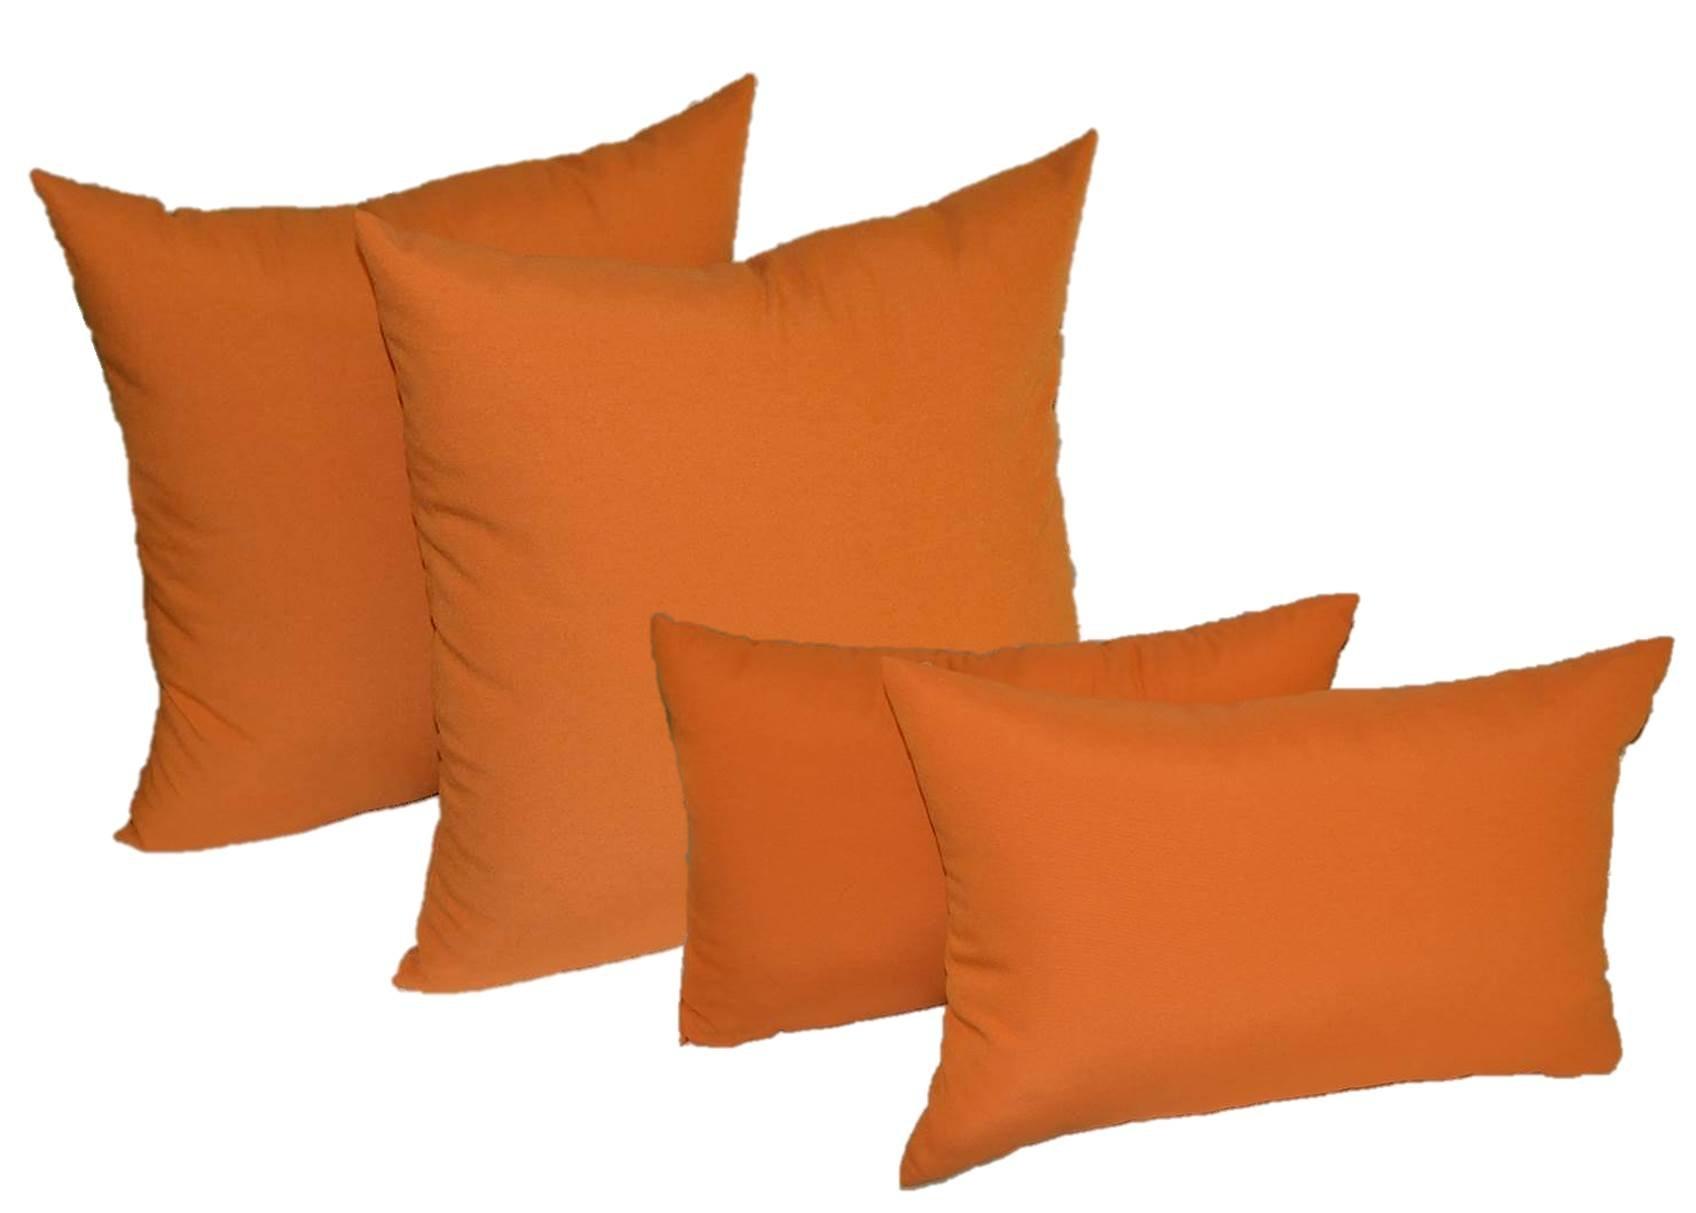 Set of 4 Indoor / Outdoor Pillows - 2 Square Pillows & 2 Rectangle / Lumbar Decorative Throw Pillows - Elegant Solid Harvest Orange - Choose Size (17'' x 17'' square & 11'' x 19'' lumbar)